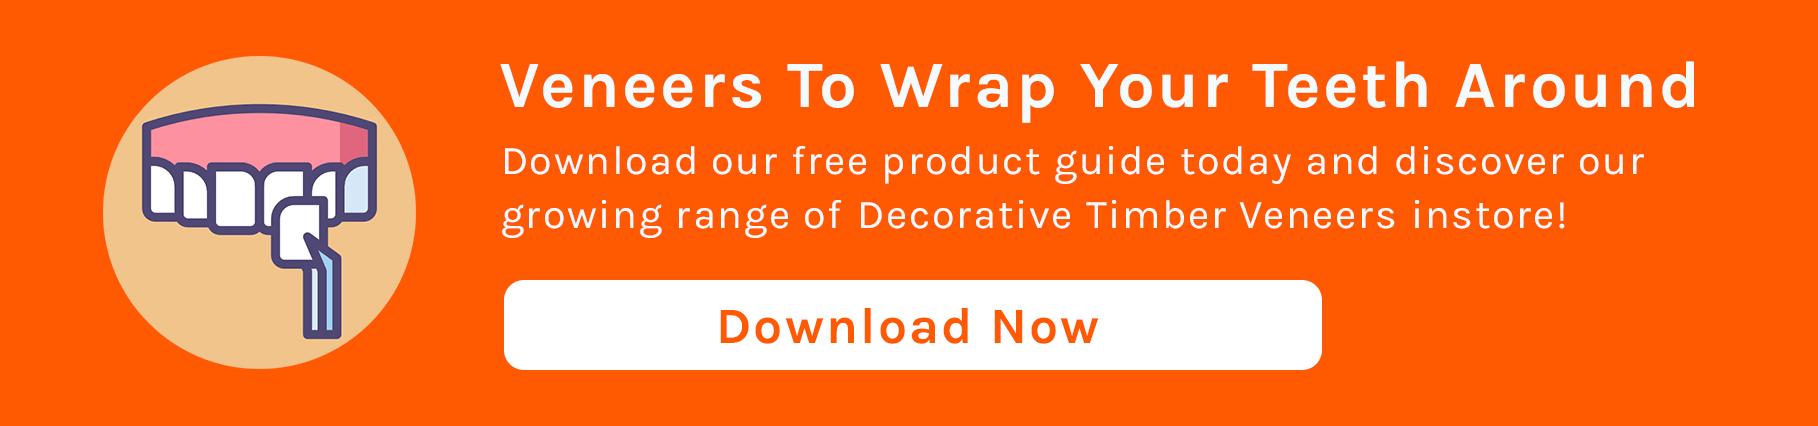 Strataply decorative timber veneers PDF download